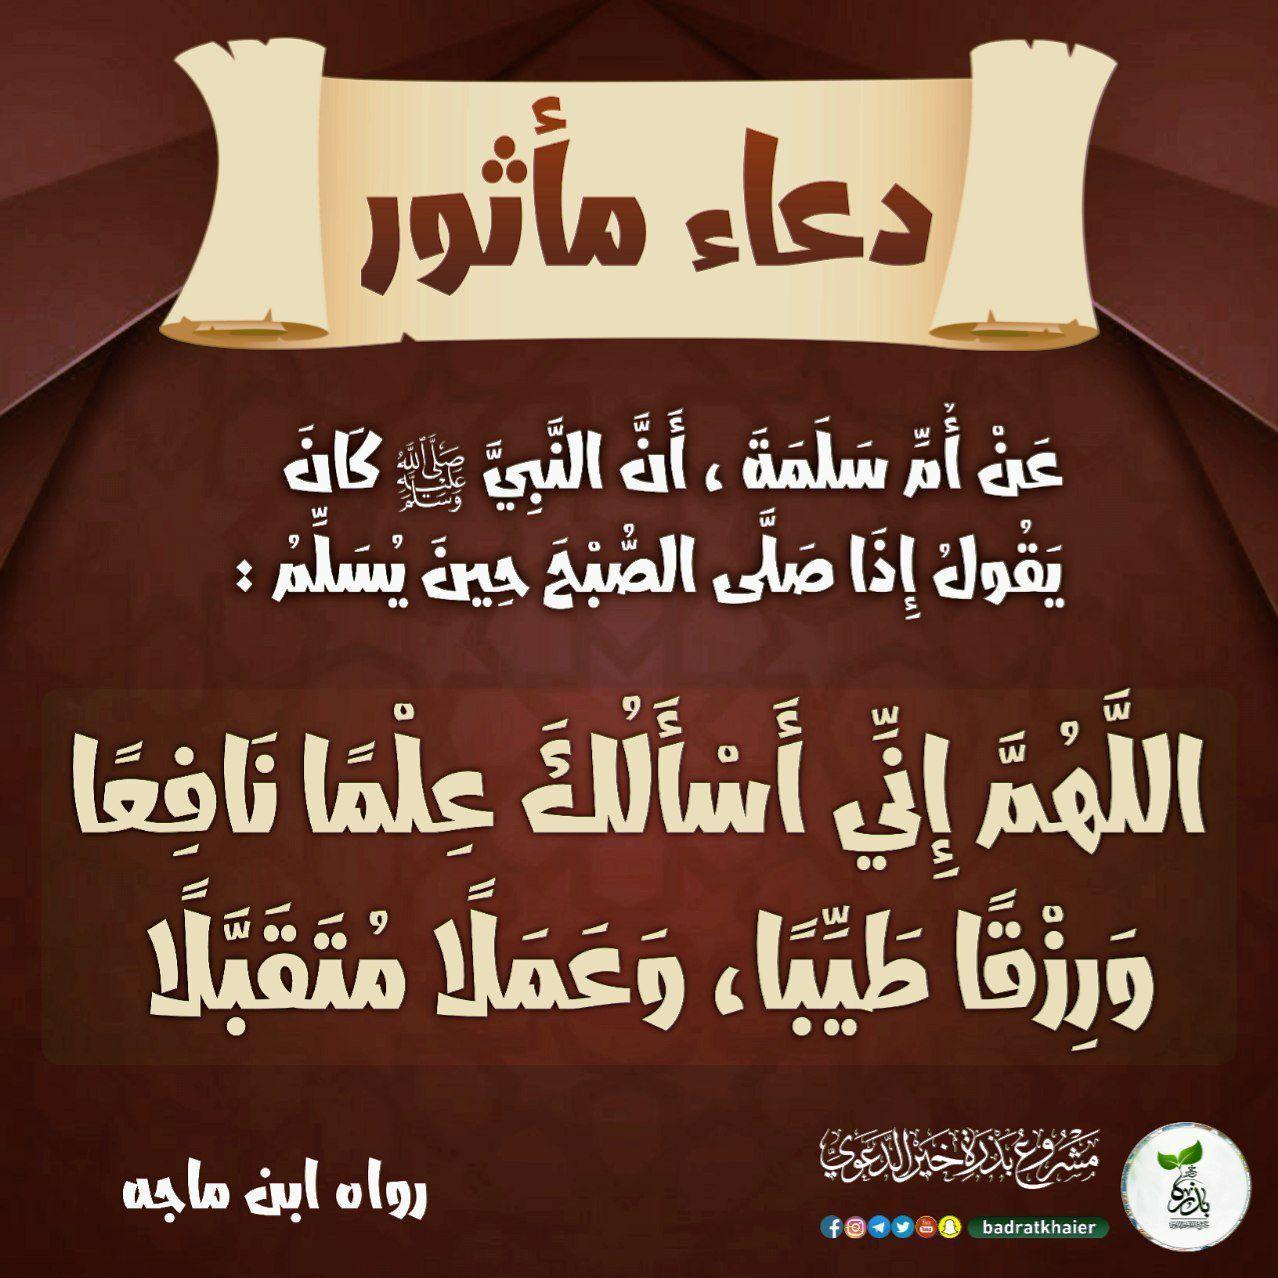 Subah Fajr Ki Farz Namaz K Baad Sunnat Azkaar Quran Quotes Positive Images Quotes